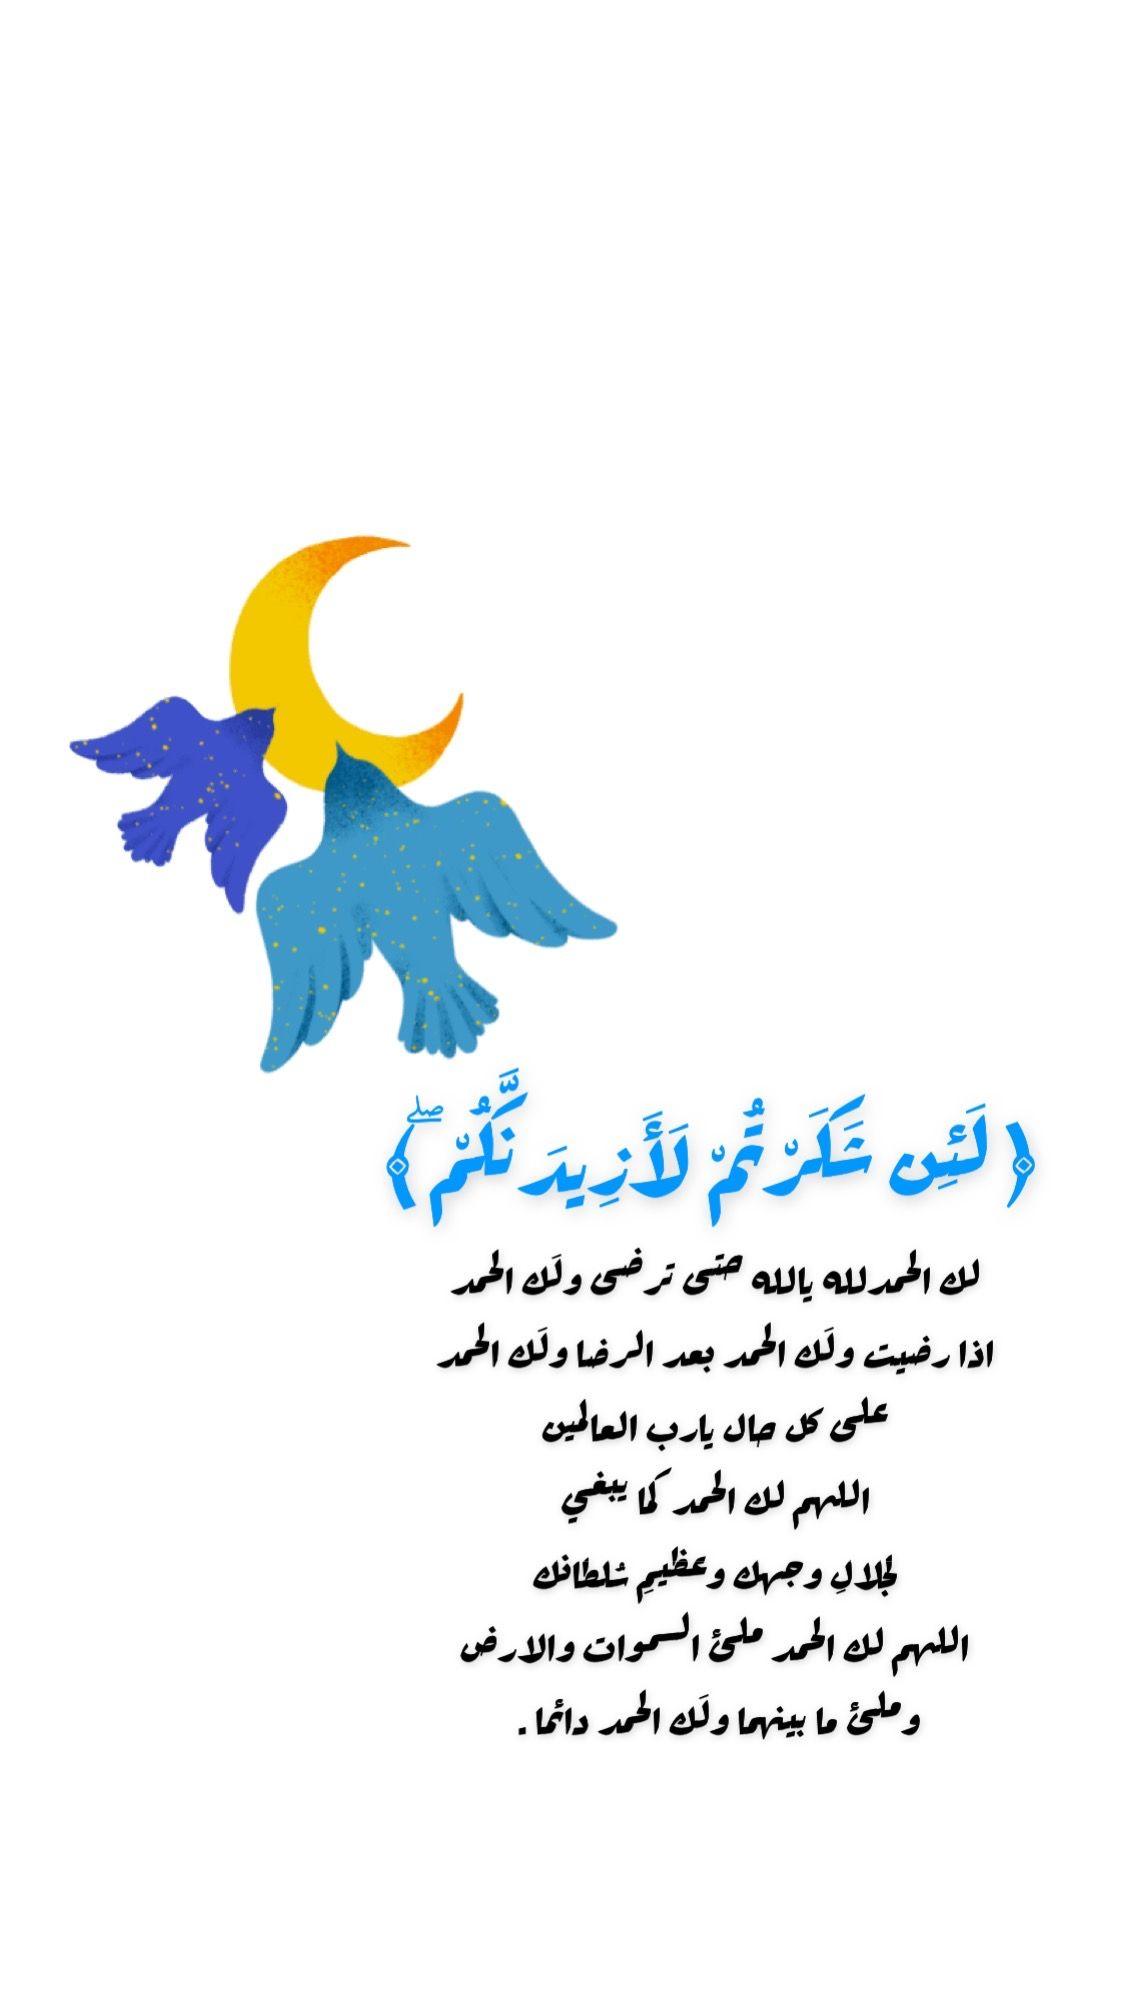 Pin By الوتين On خلفيات دينية Words Quotes Arabic Quotes